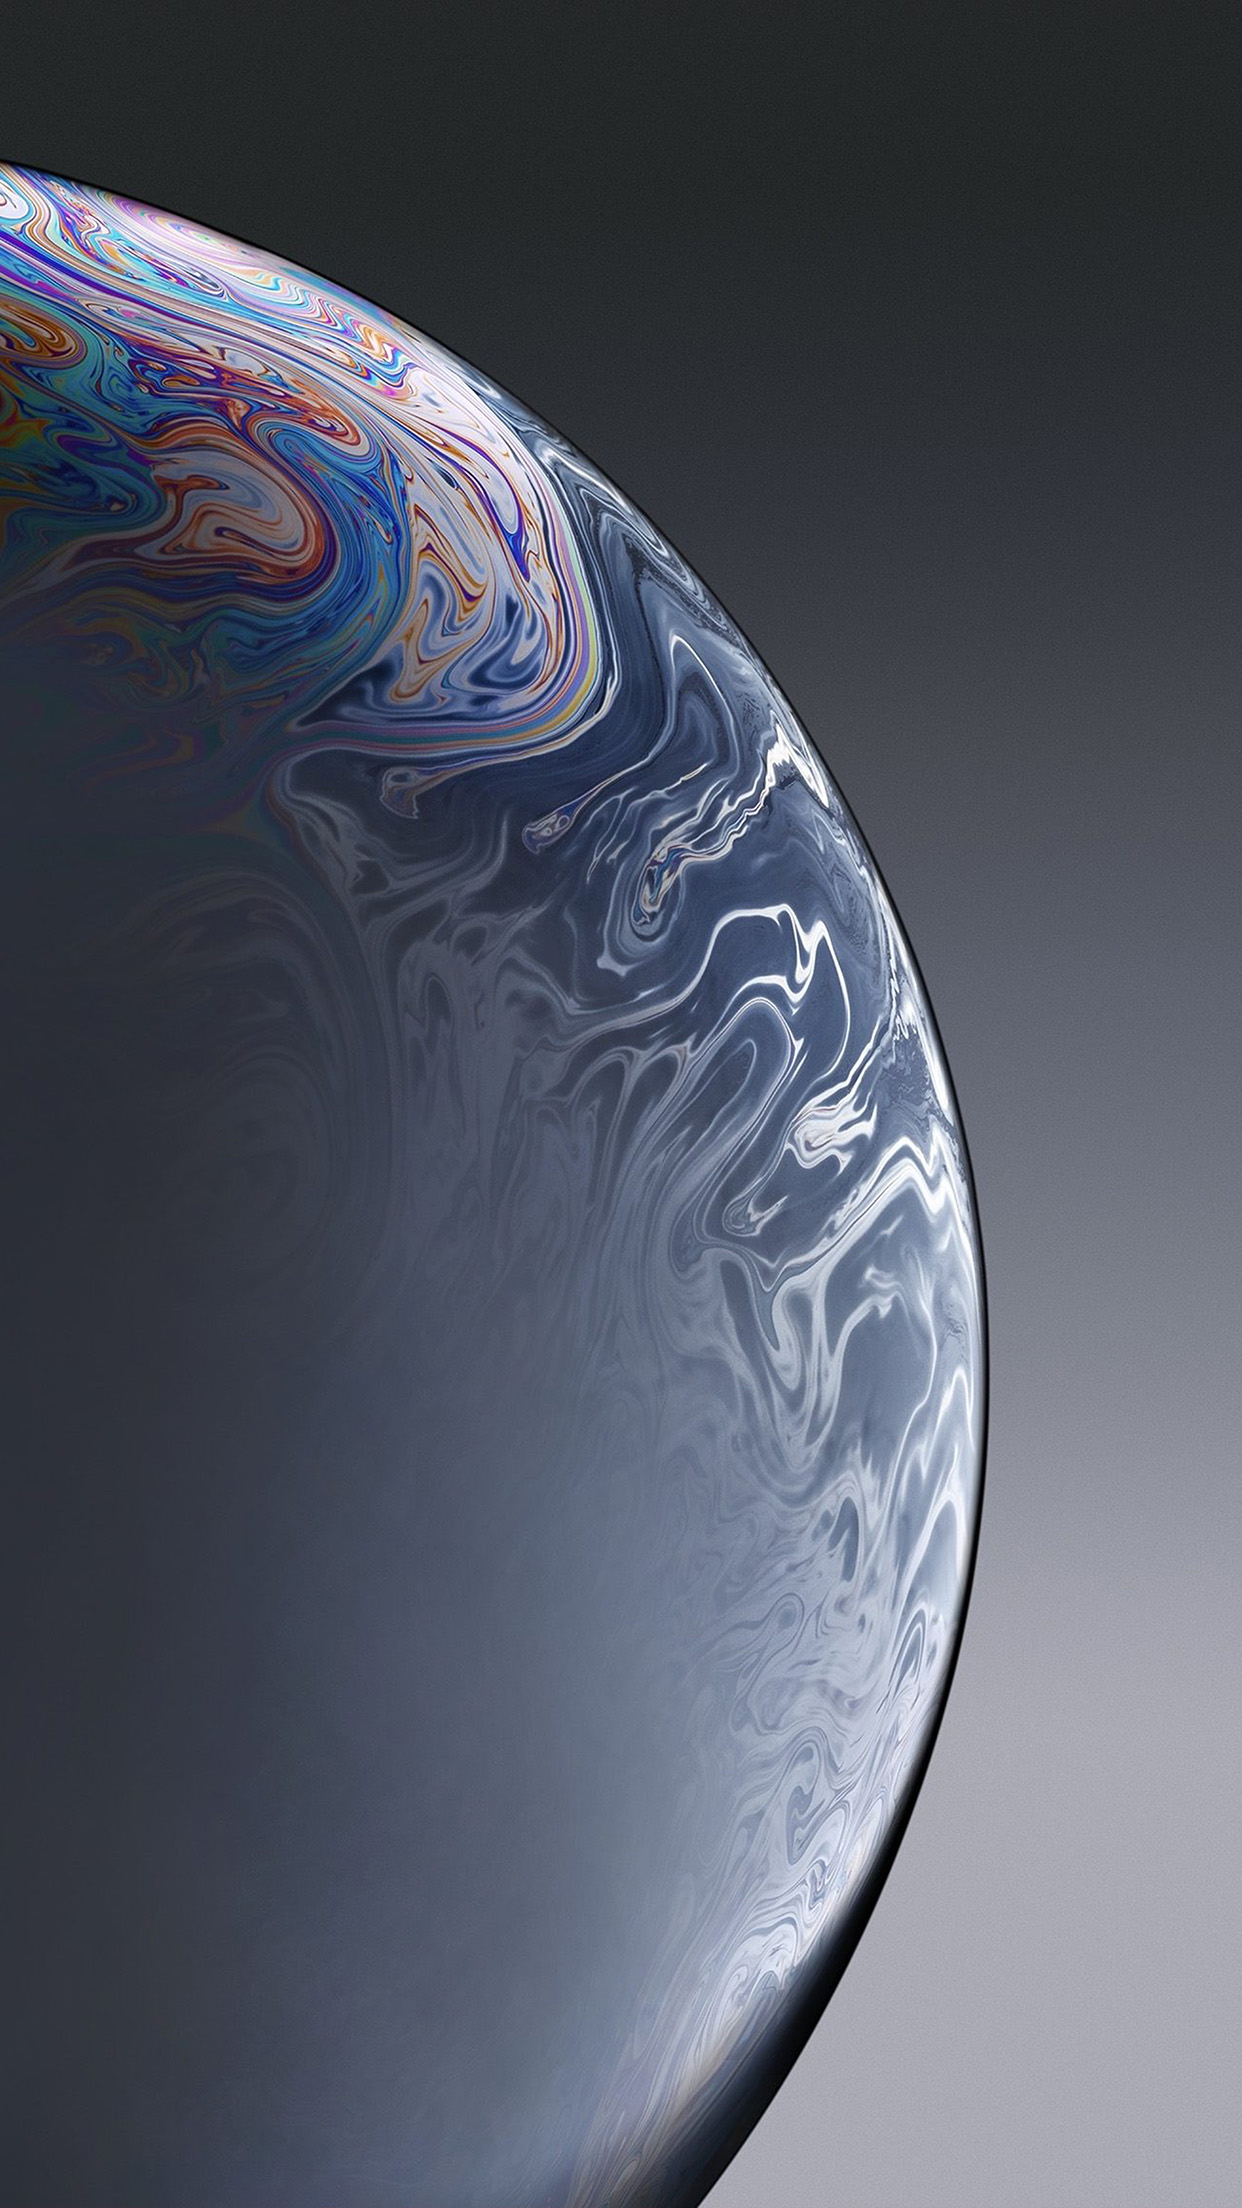 f9b3e19d6c5 iPhonepapers.com   iPhone wallpaper   bg38-apple-iphone-xs-space ...